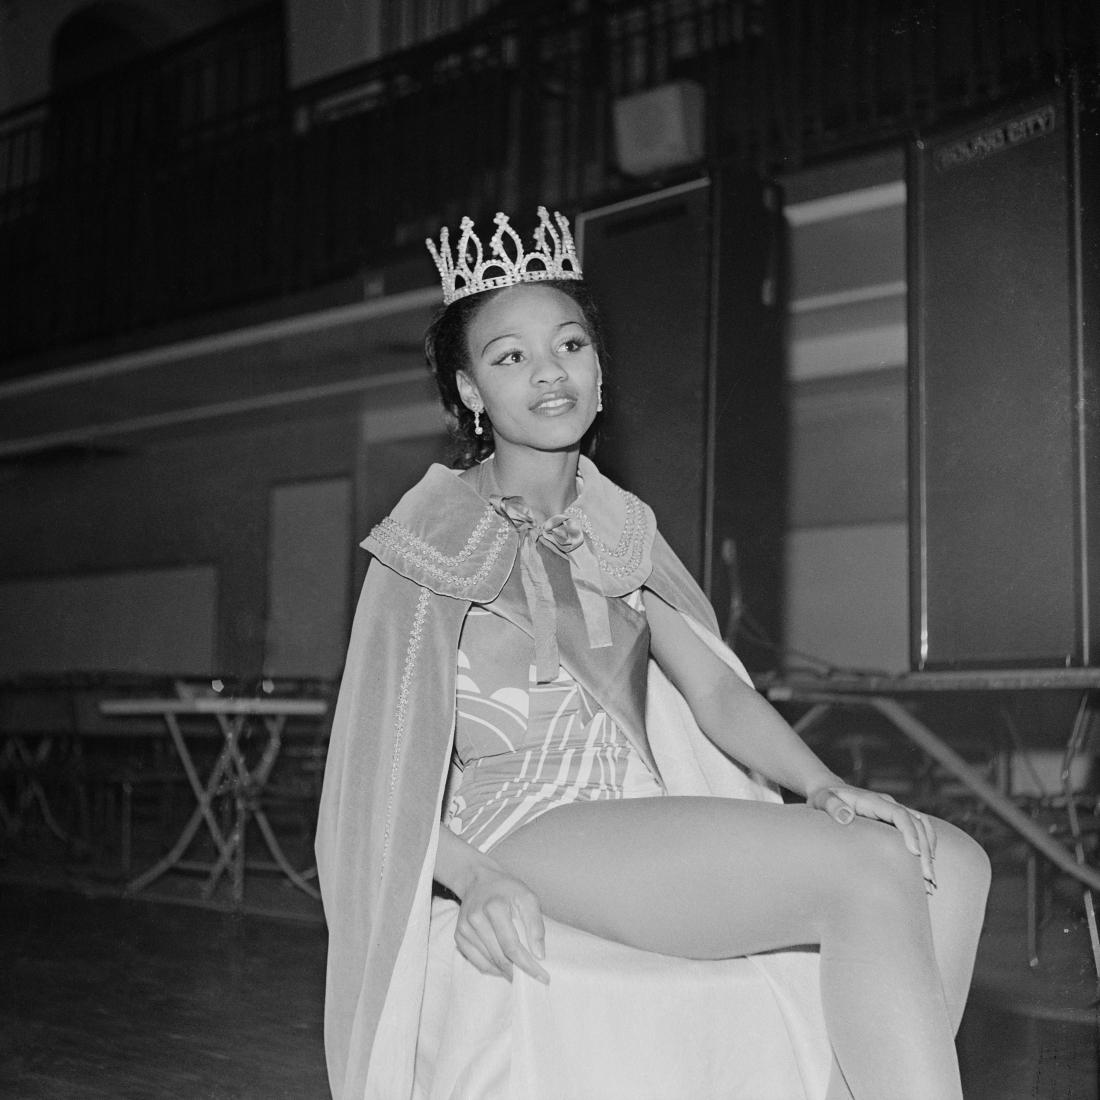 (unidentified) Beauty queen, London, 1970s. From the portfolio 'Black Beauty Pageants'. © Raphael Albert, courtesy Autograph ABP